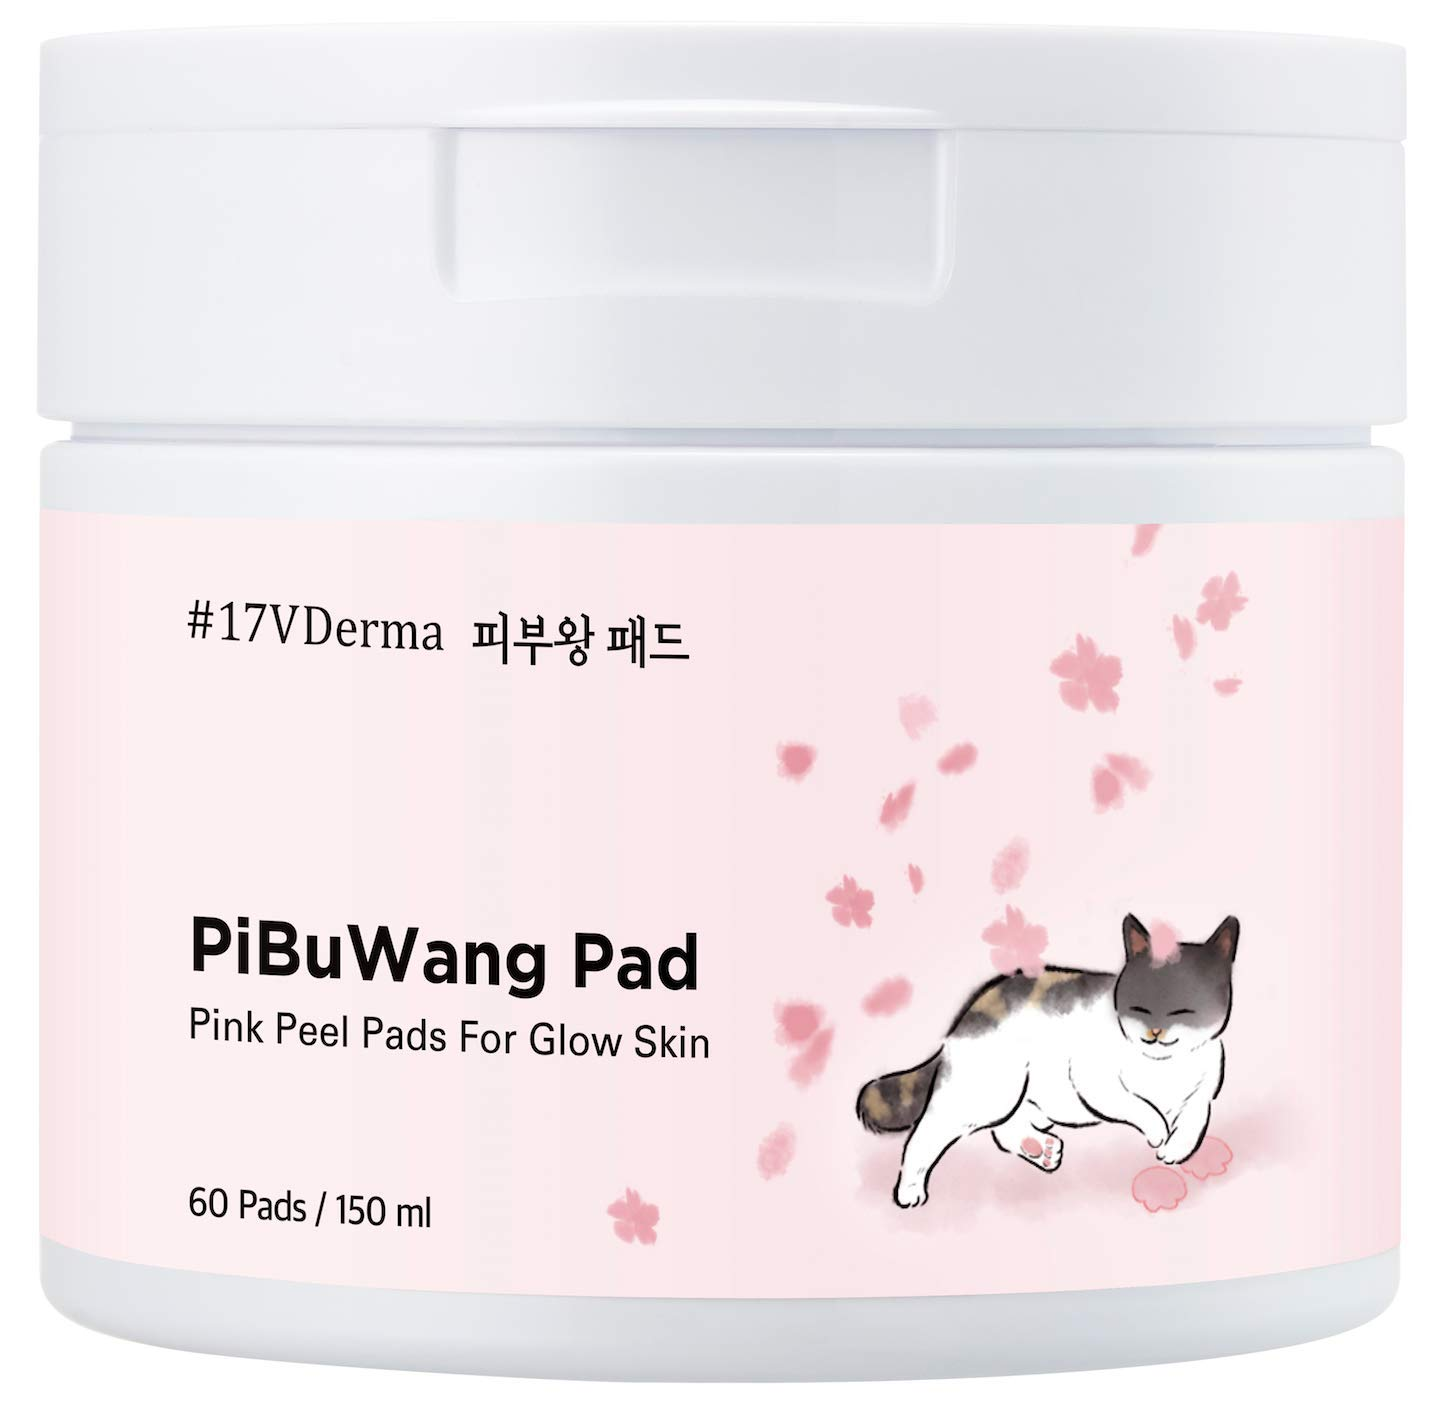 17VDerma Korean Skin Treatment Face Toner | Peel Pads with No Irritation Formula | Premium K Beauty Pibuwang Vegan Facial Care Pink Pads with PHA 60 ct. 150ml by #17VDerma